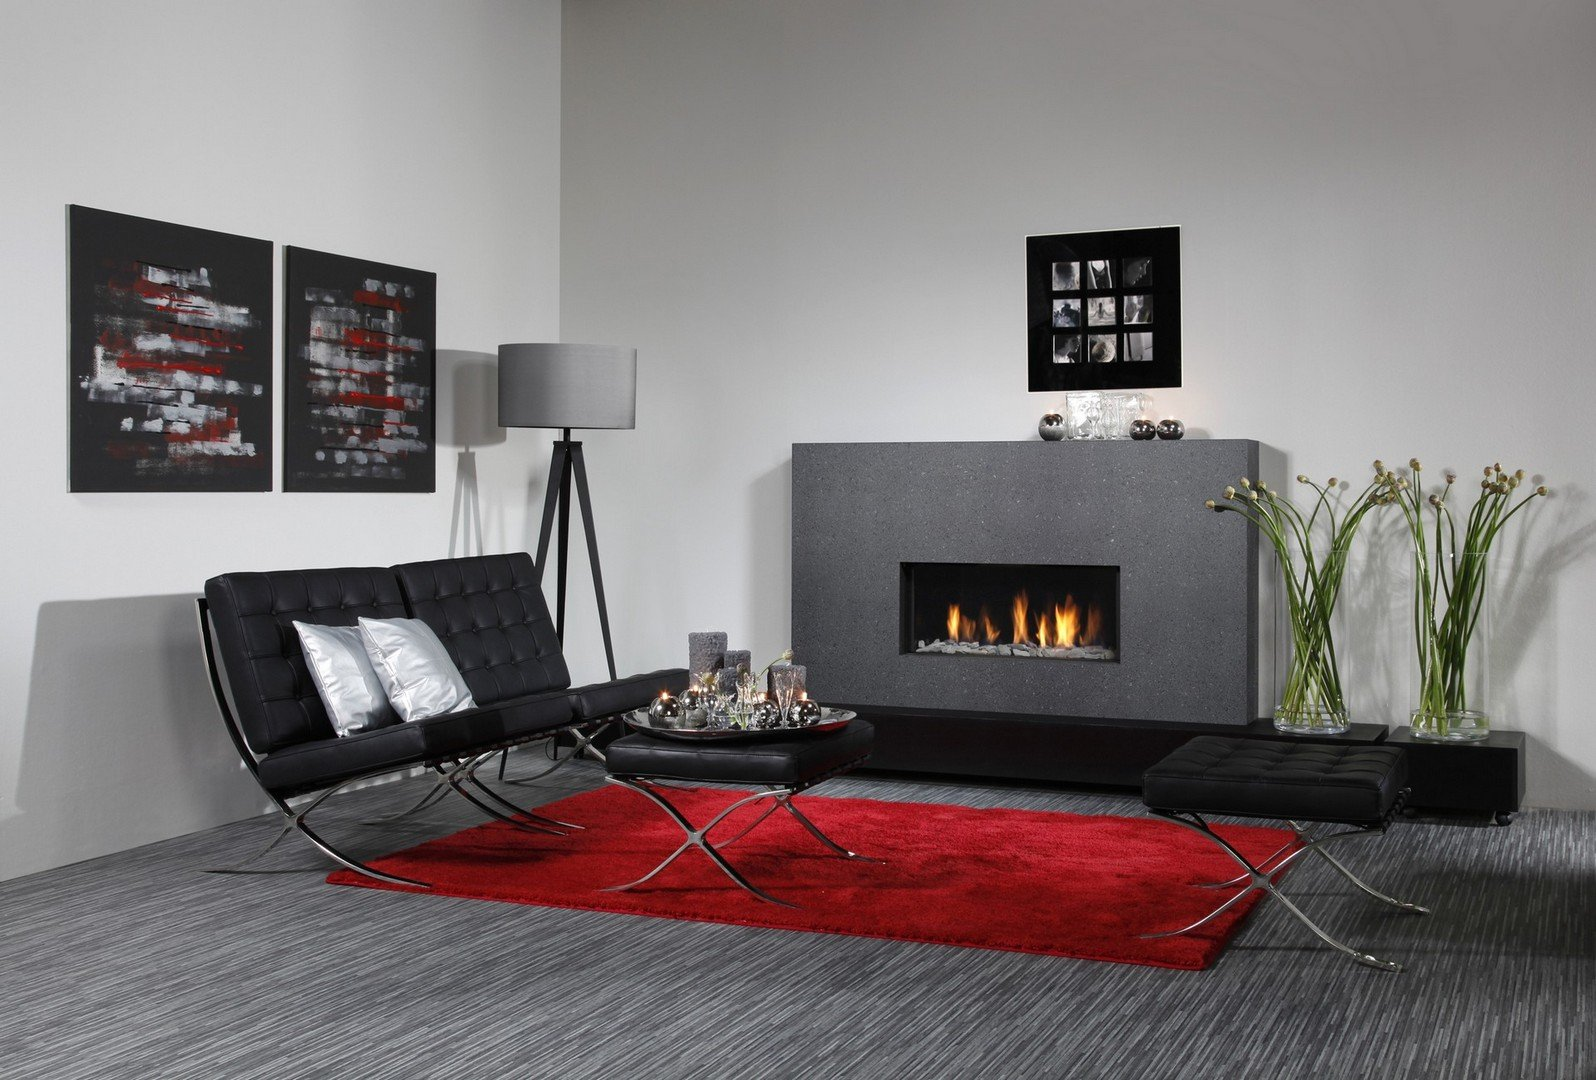 Faber Relaxed Premium M prijs kopen